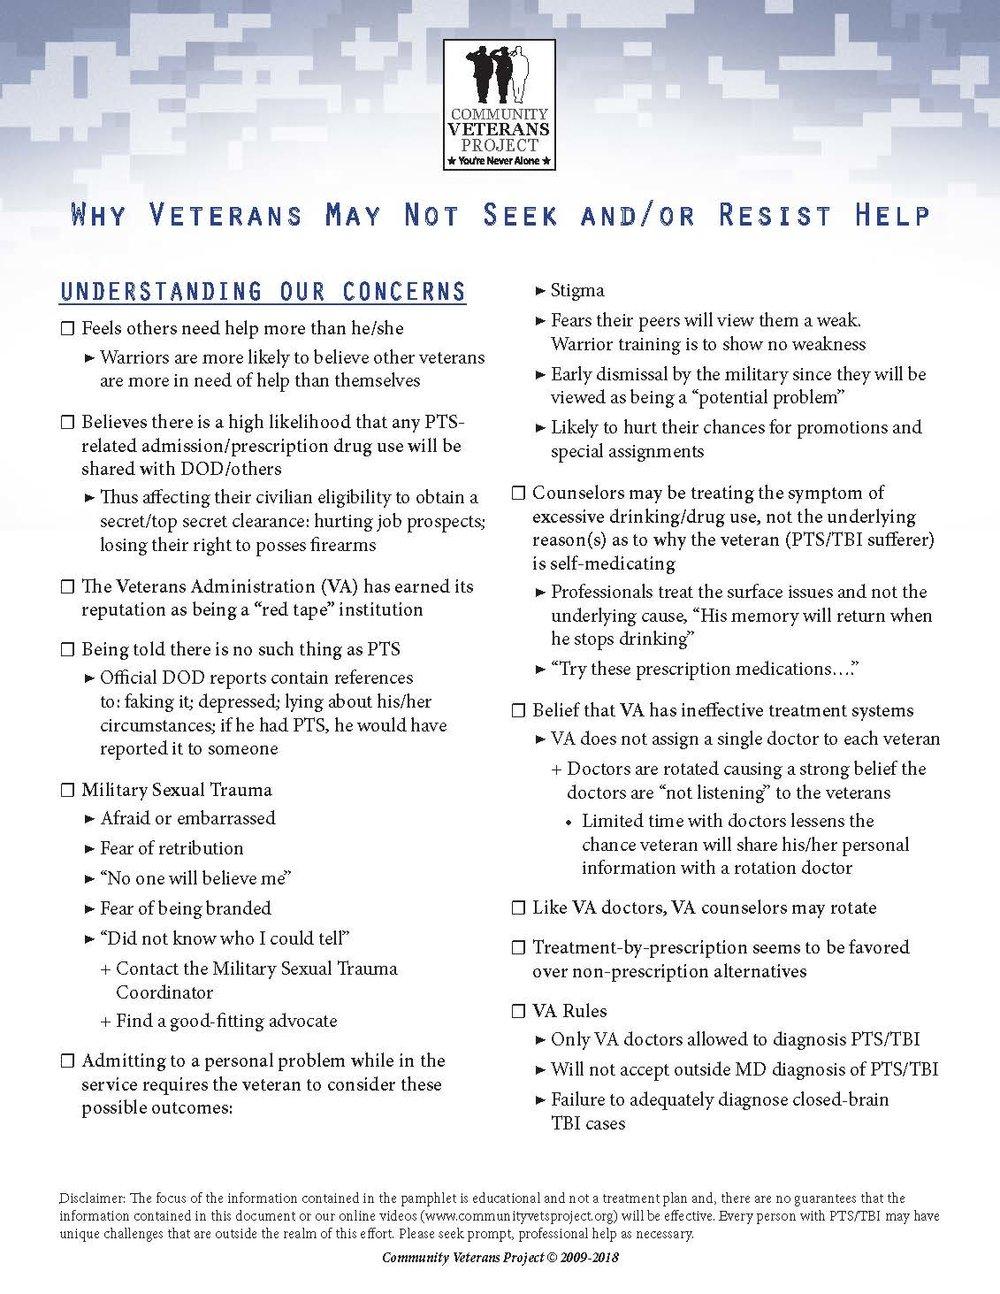 WhyVetsMayNotSeekHelp_Page_1.jpg